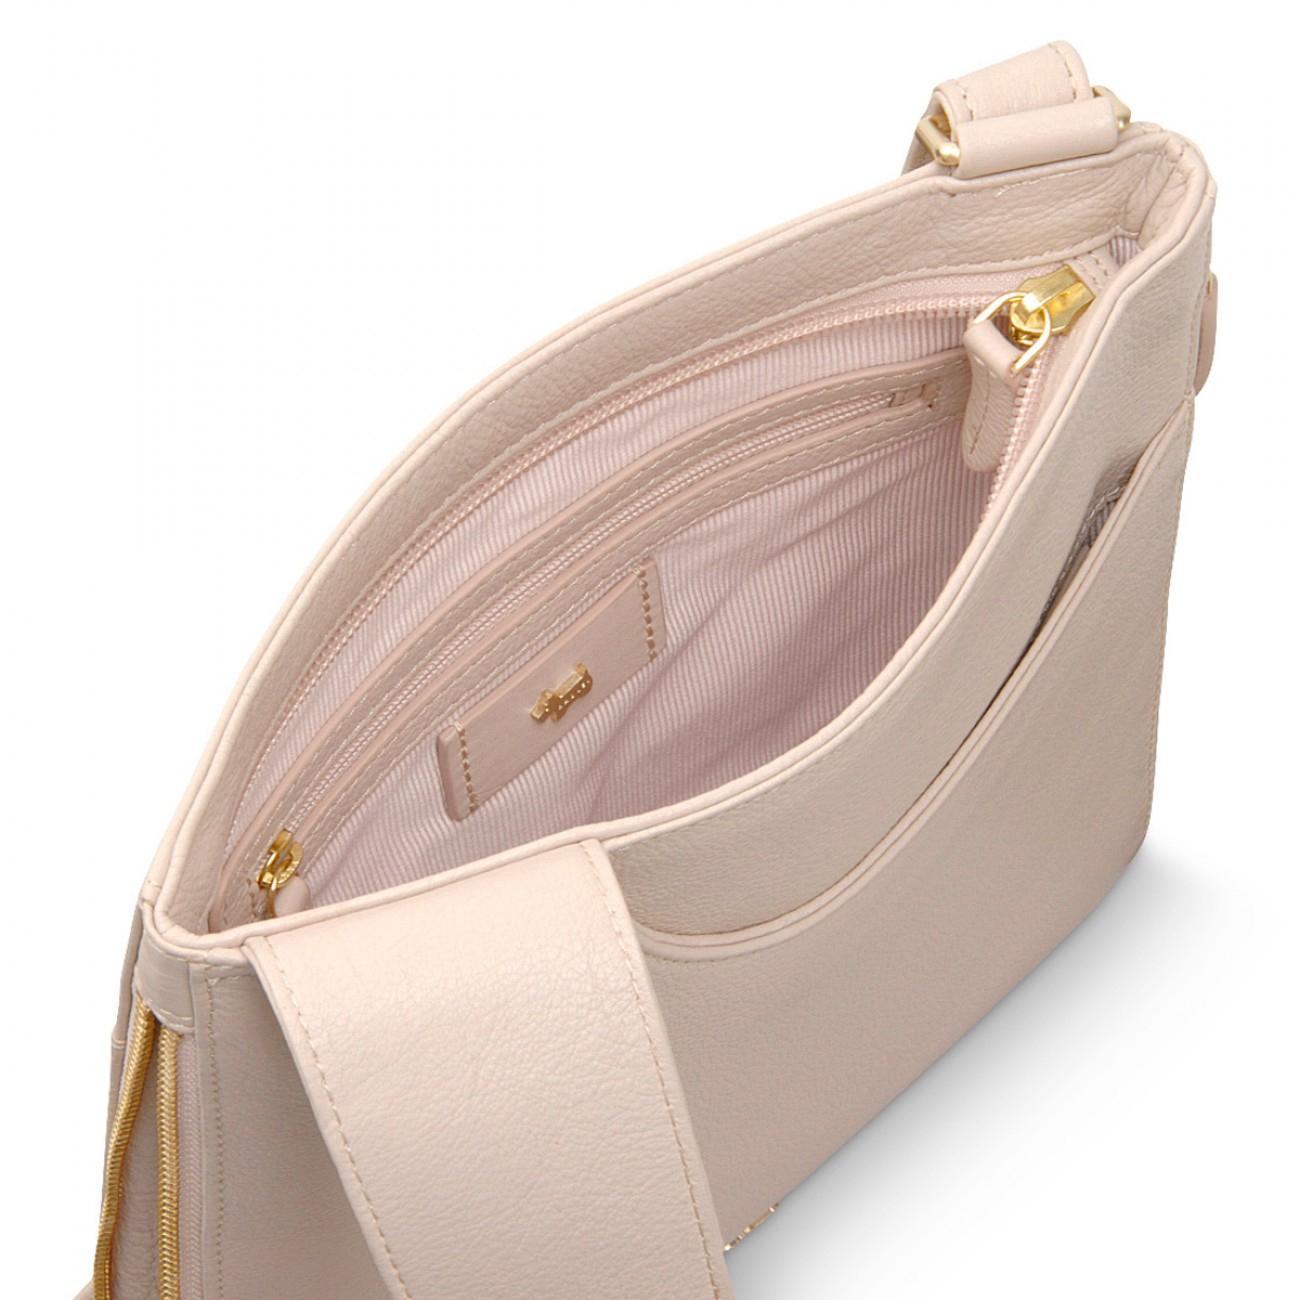 3e07cf9a6cc Radley Dove Grey Pockets Medium Zip Around Cross Body Bag | Jarrold ...